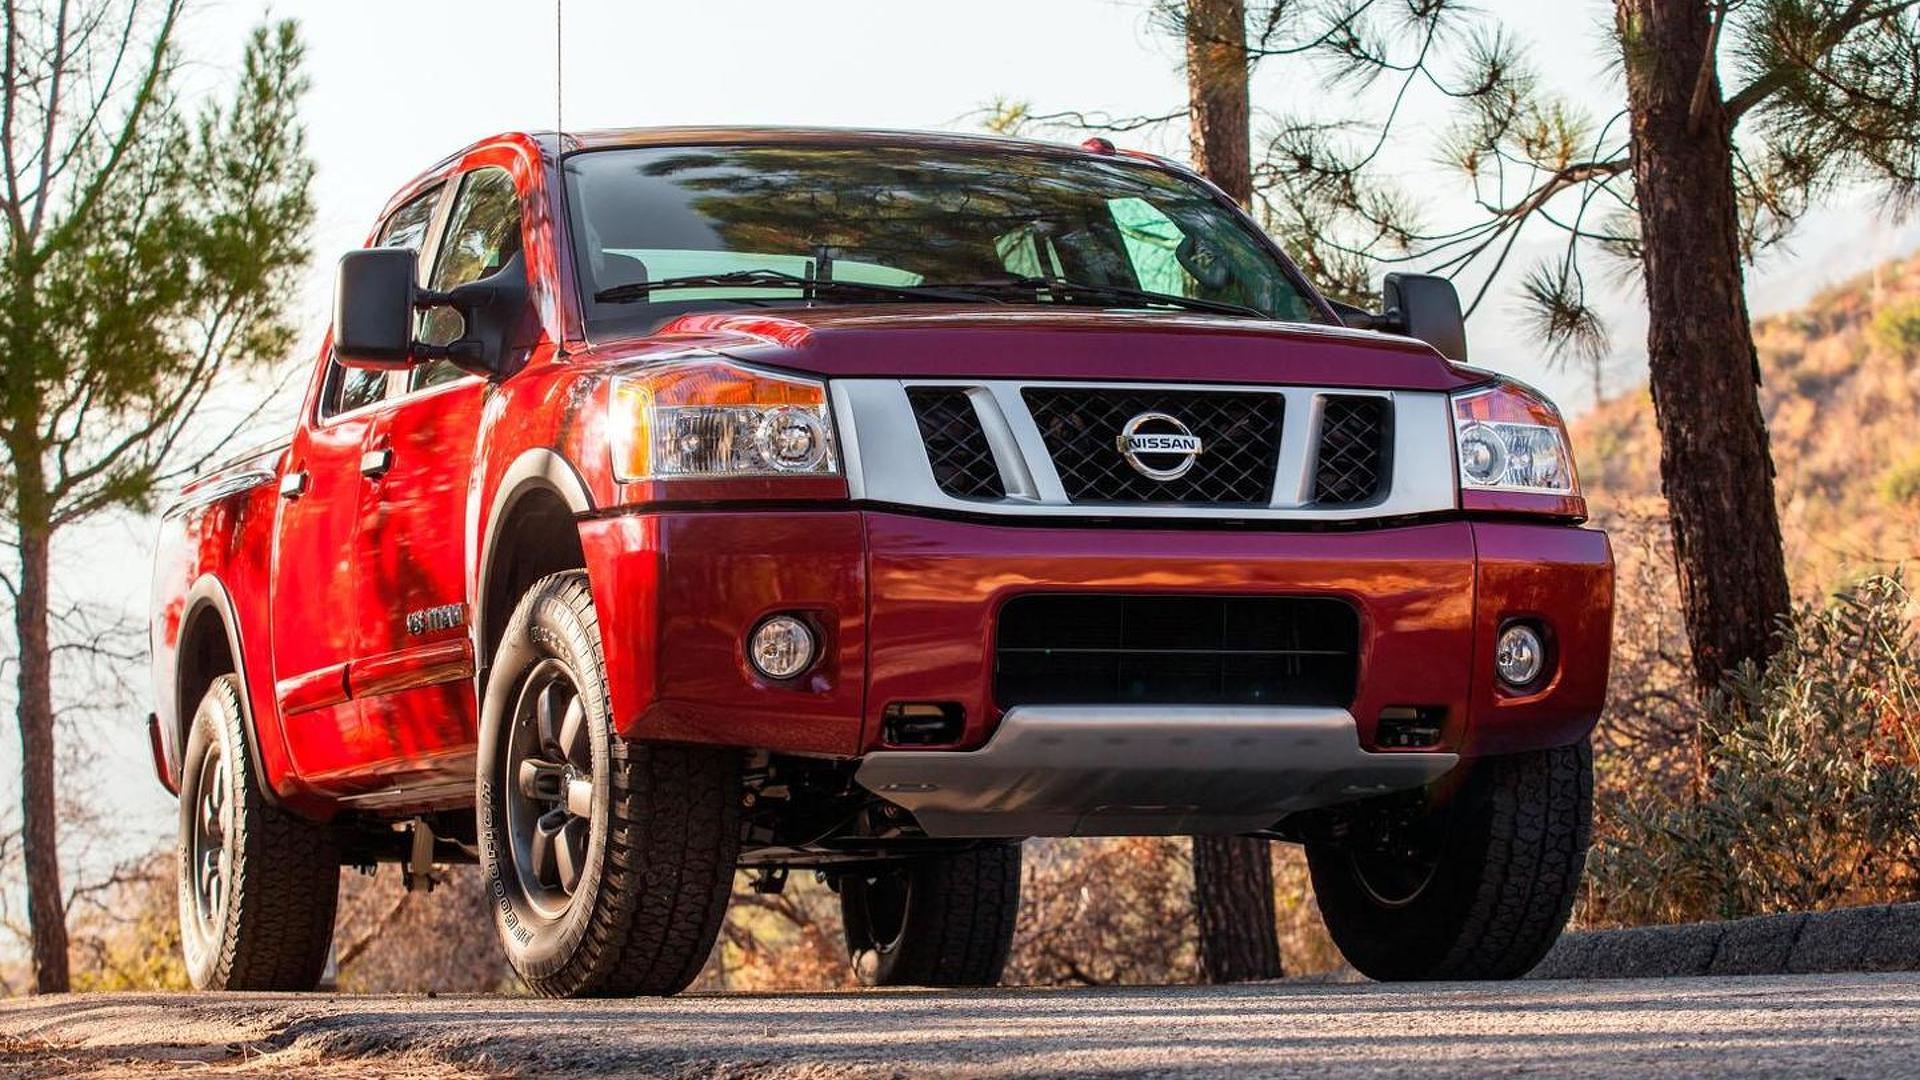 Mercedes considered Nissan Titan & Frontier based pickups - report